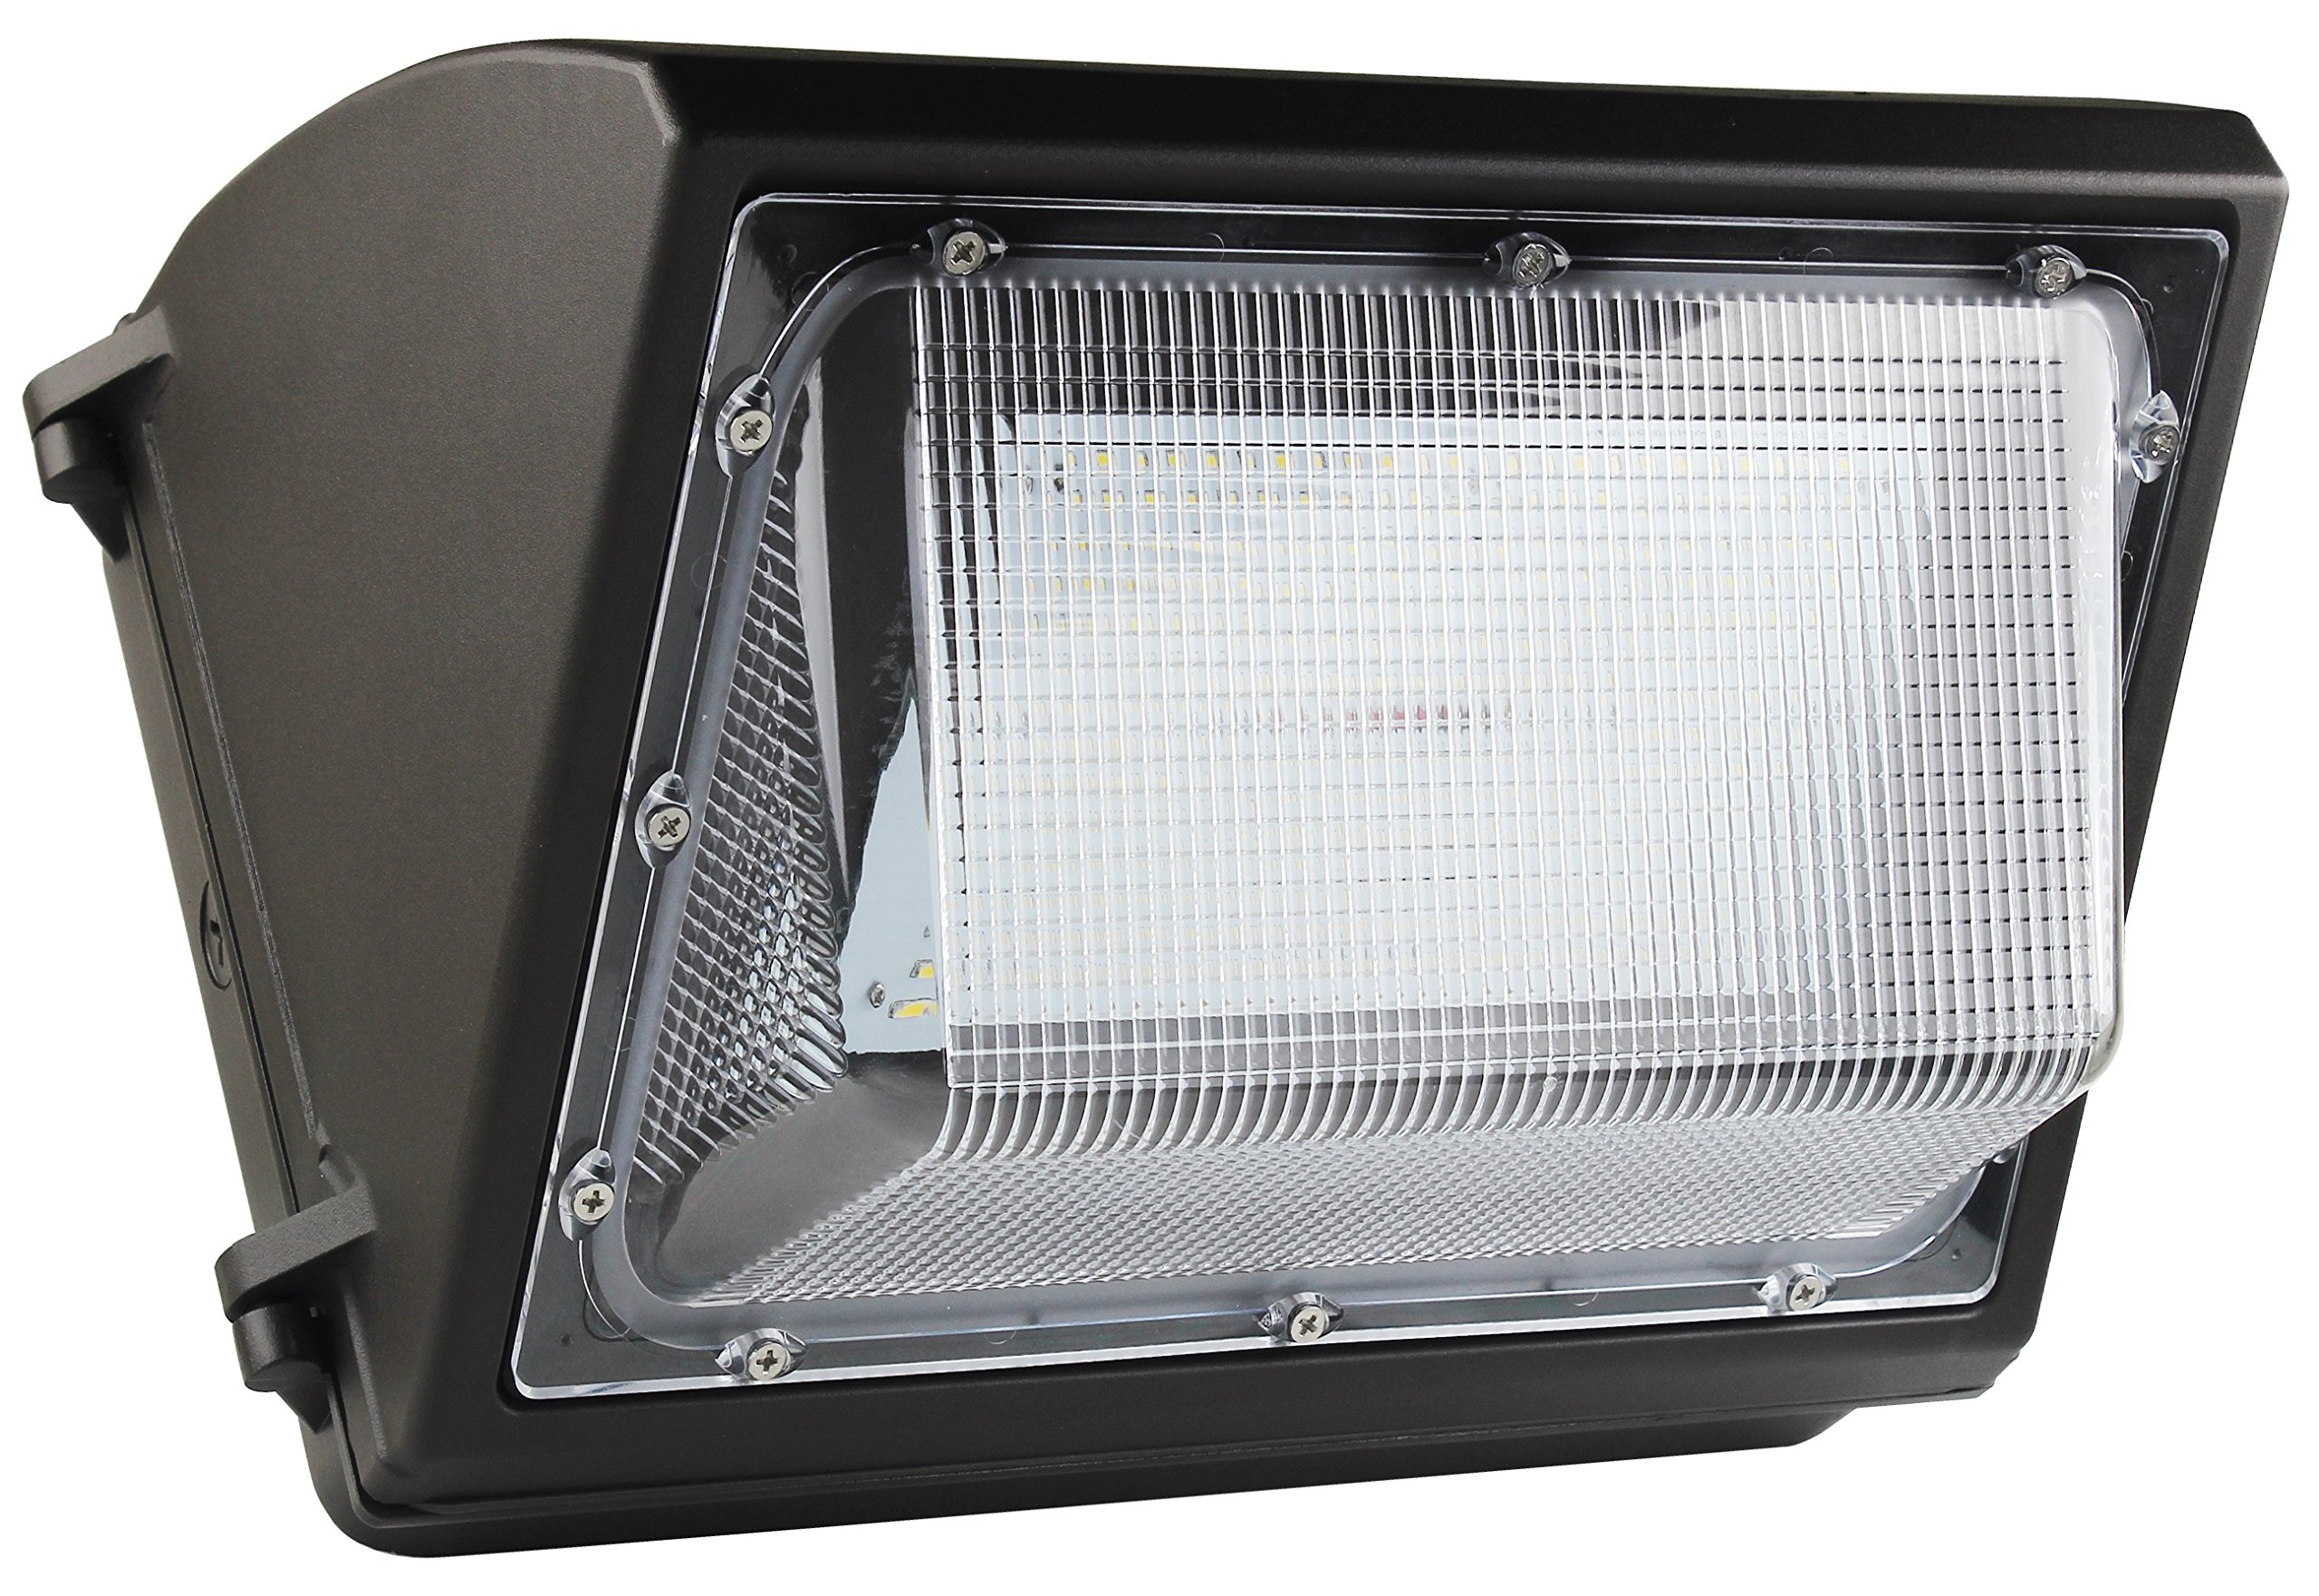 80 Watt LED Wall Pack Light - 10400 Lumens- High Efficiency 130 Lumen to Watt- DLC Premium Listed - Wall Pack LED -5000K Bright White - Replaces 250watt Metal Halide HPS